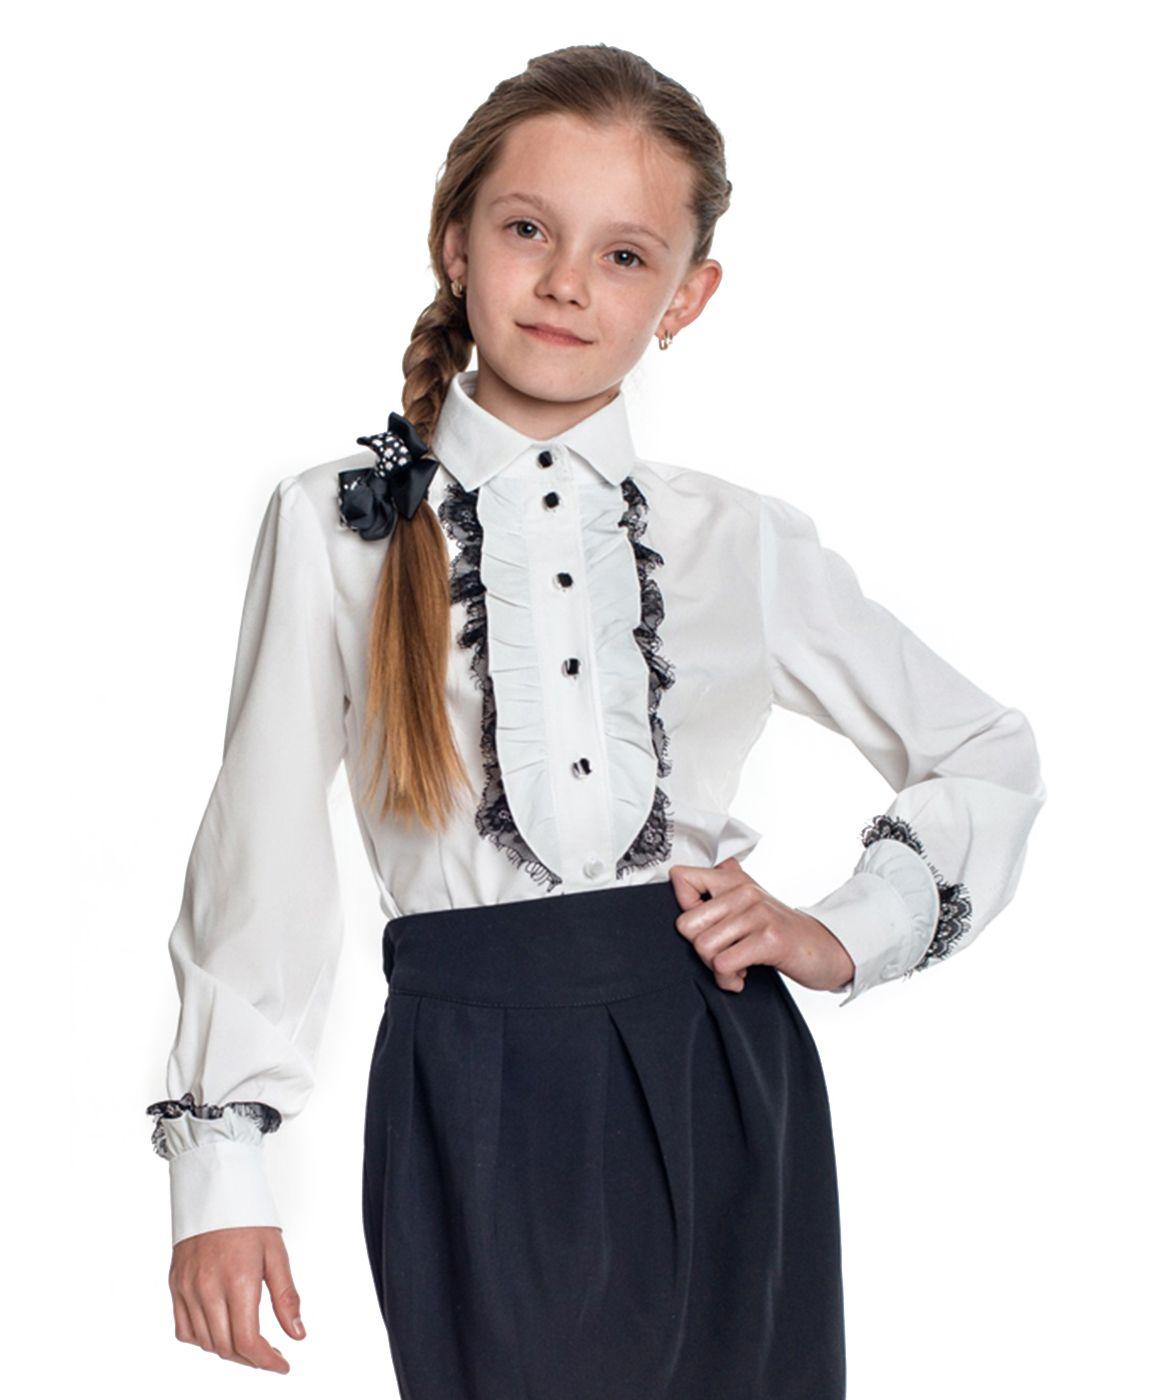 2255c37be7b Нарядная блузка LisaWeta со скидкой 43% (арт.19829984) — купить за 725  рублей на распродаже Mamsy.ru